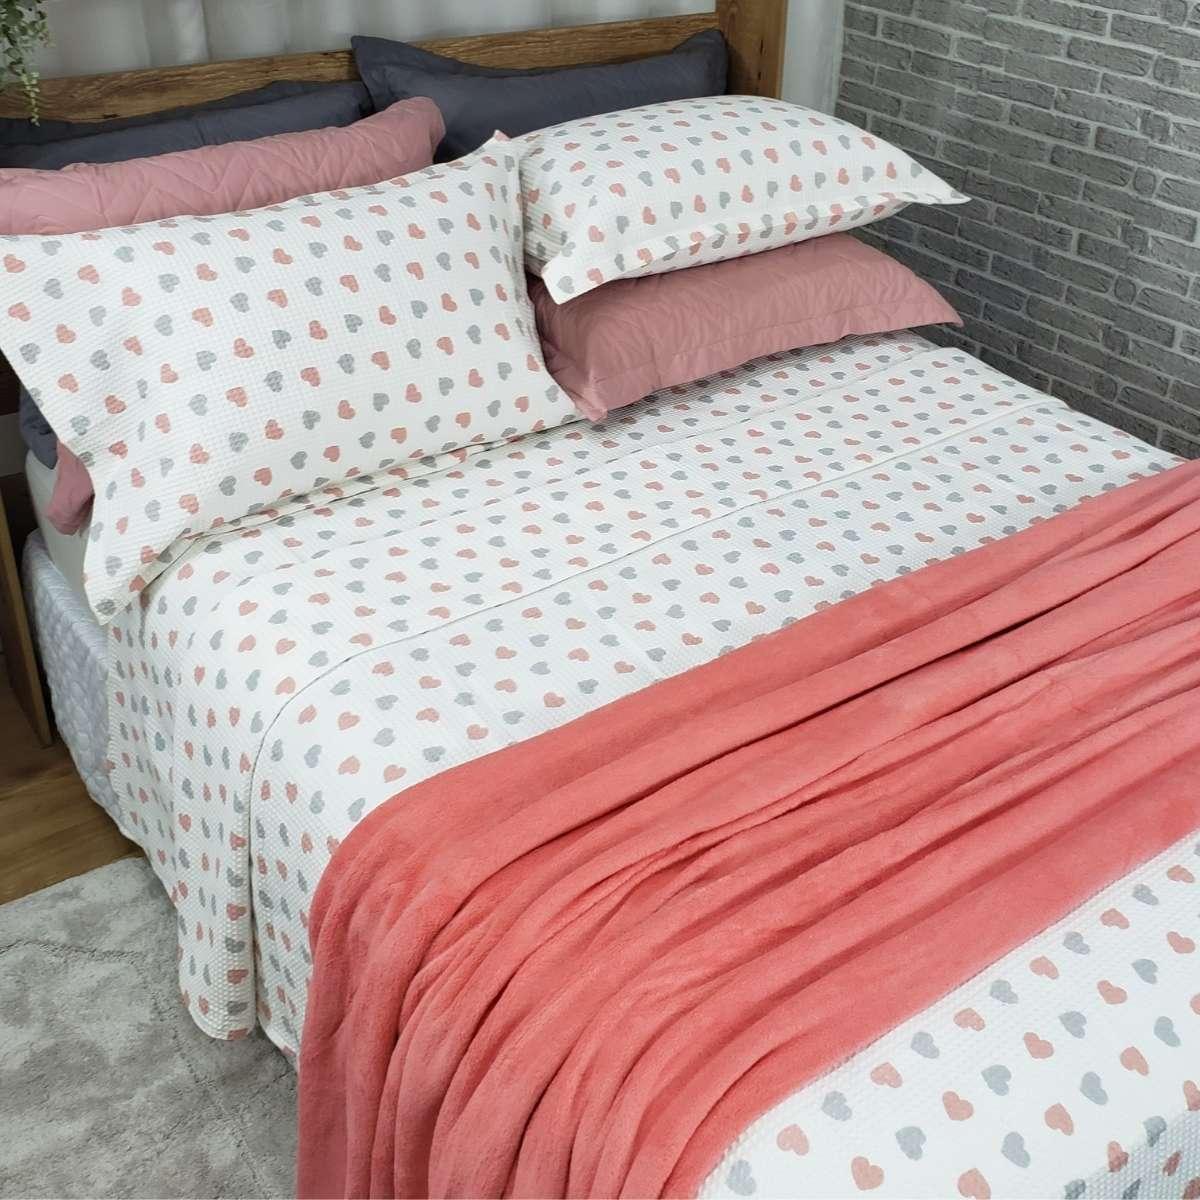 Manta Cobertor Sofisticata Queen 220x240 SALMAO